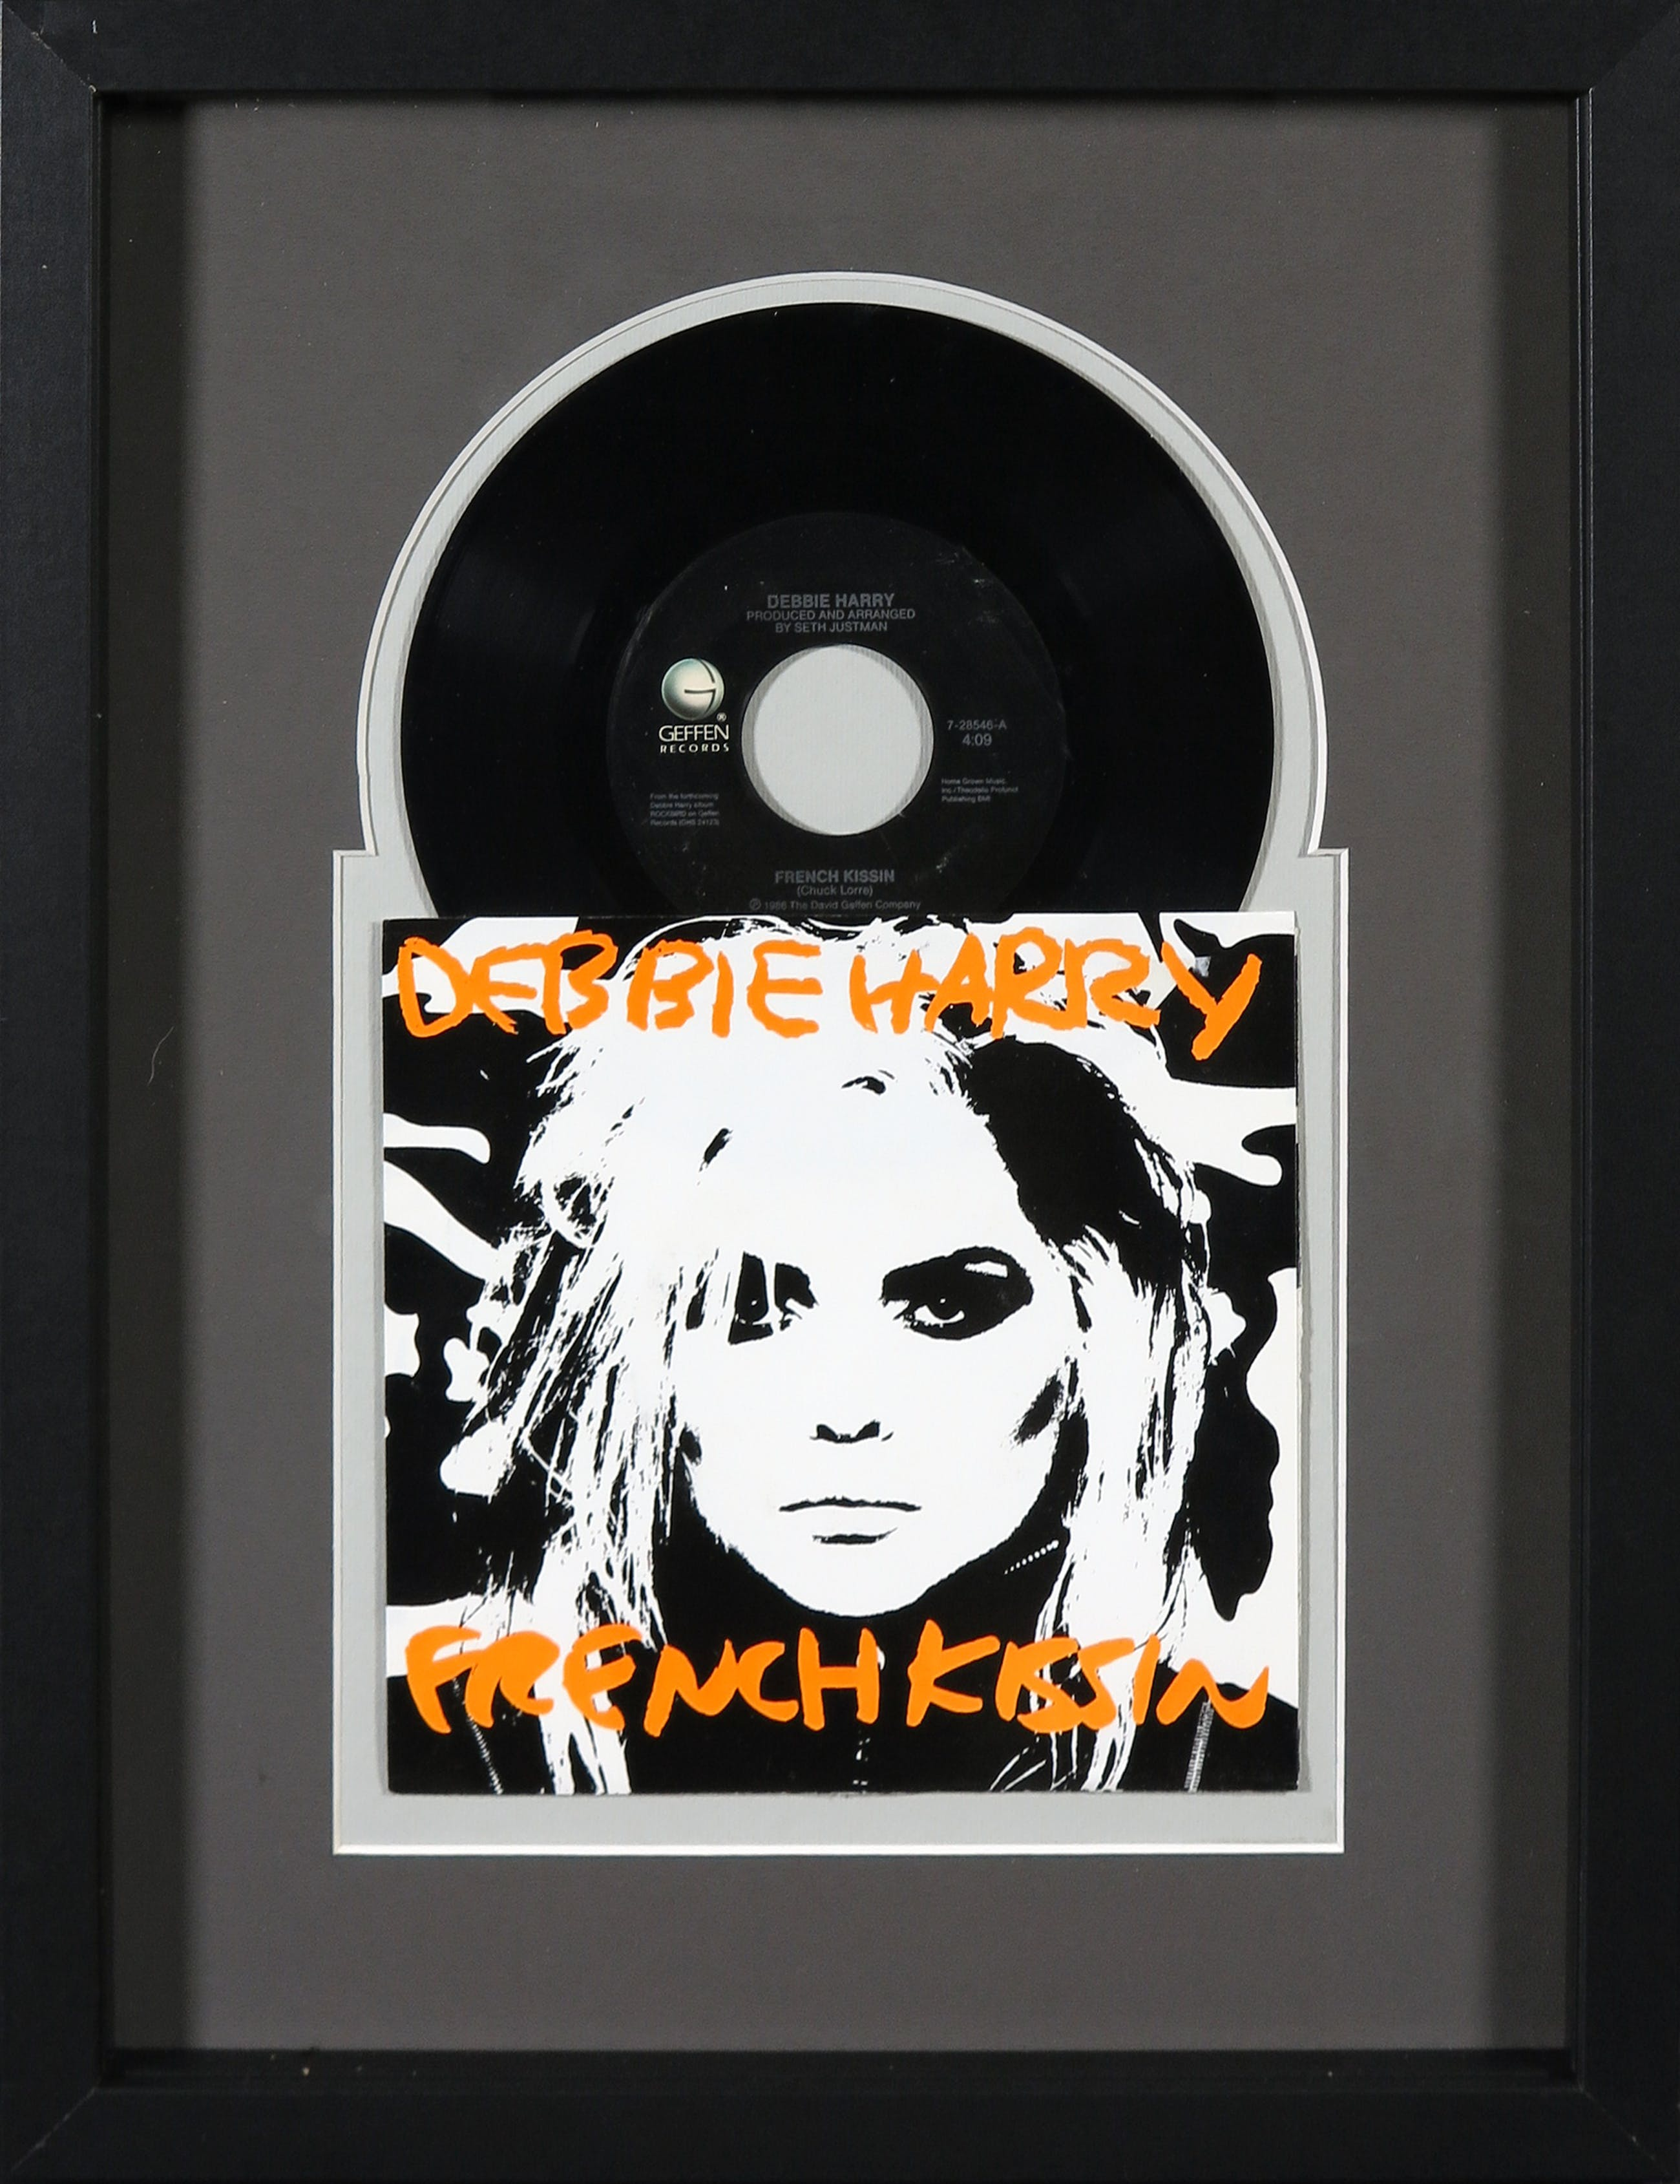 Andy Warhol - French Kissin - Debbie Harry kopen? Bied vanaf 1!